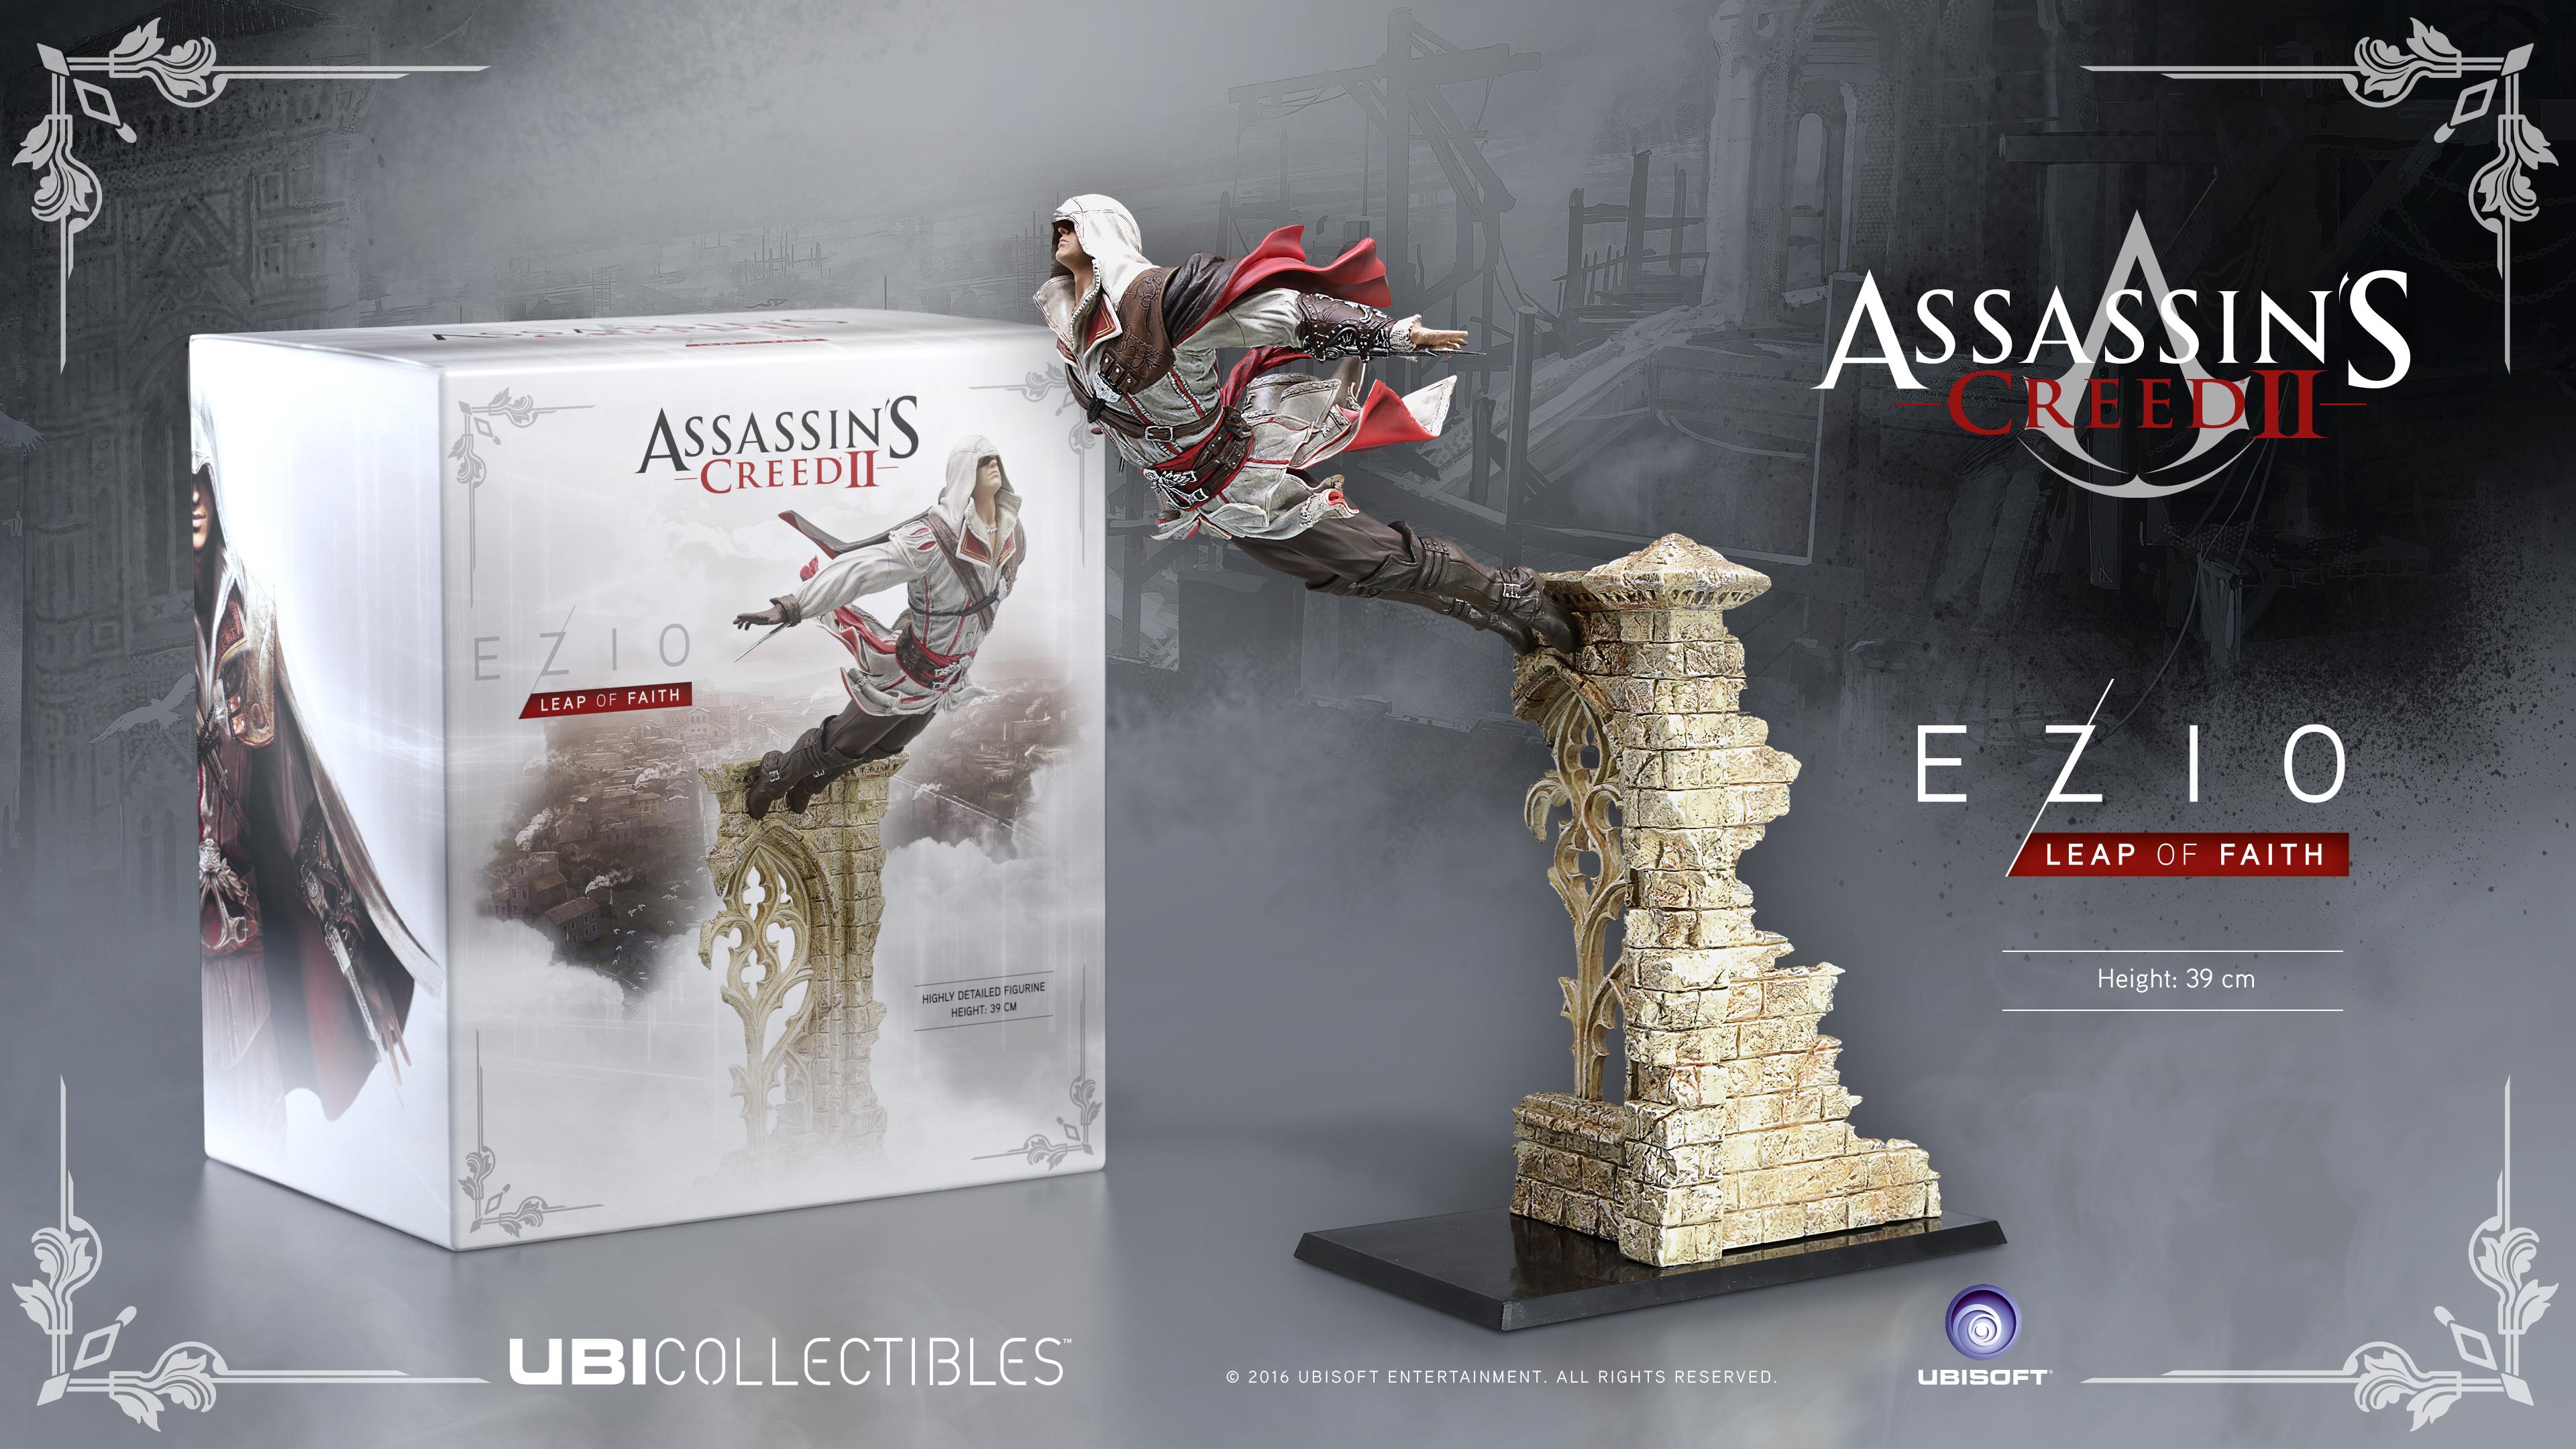 Ezio in Assassin's Creed II